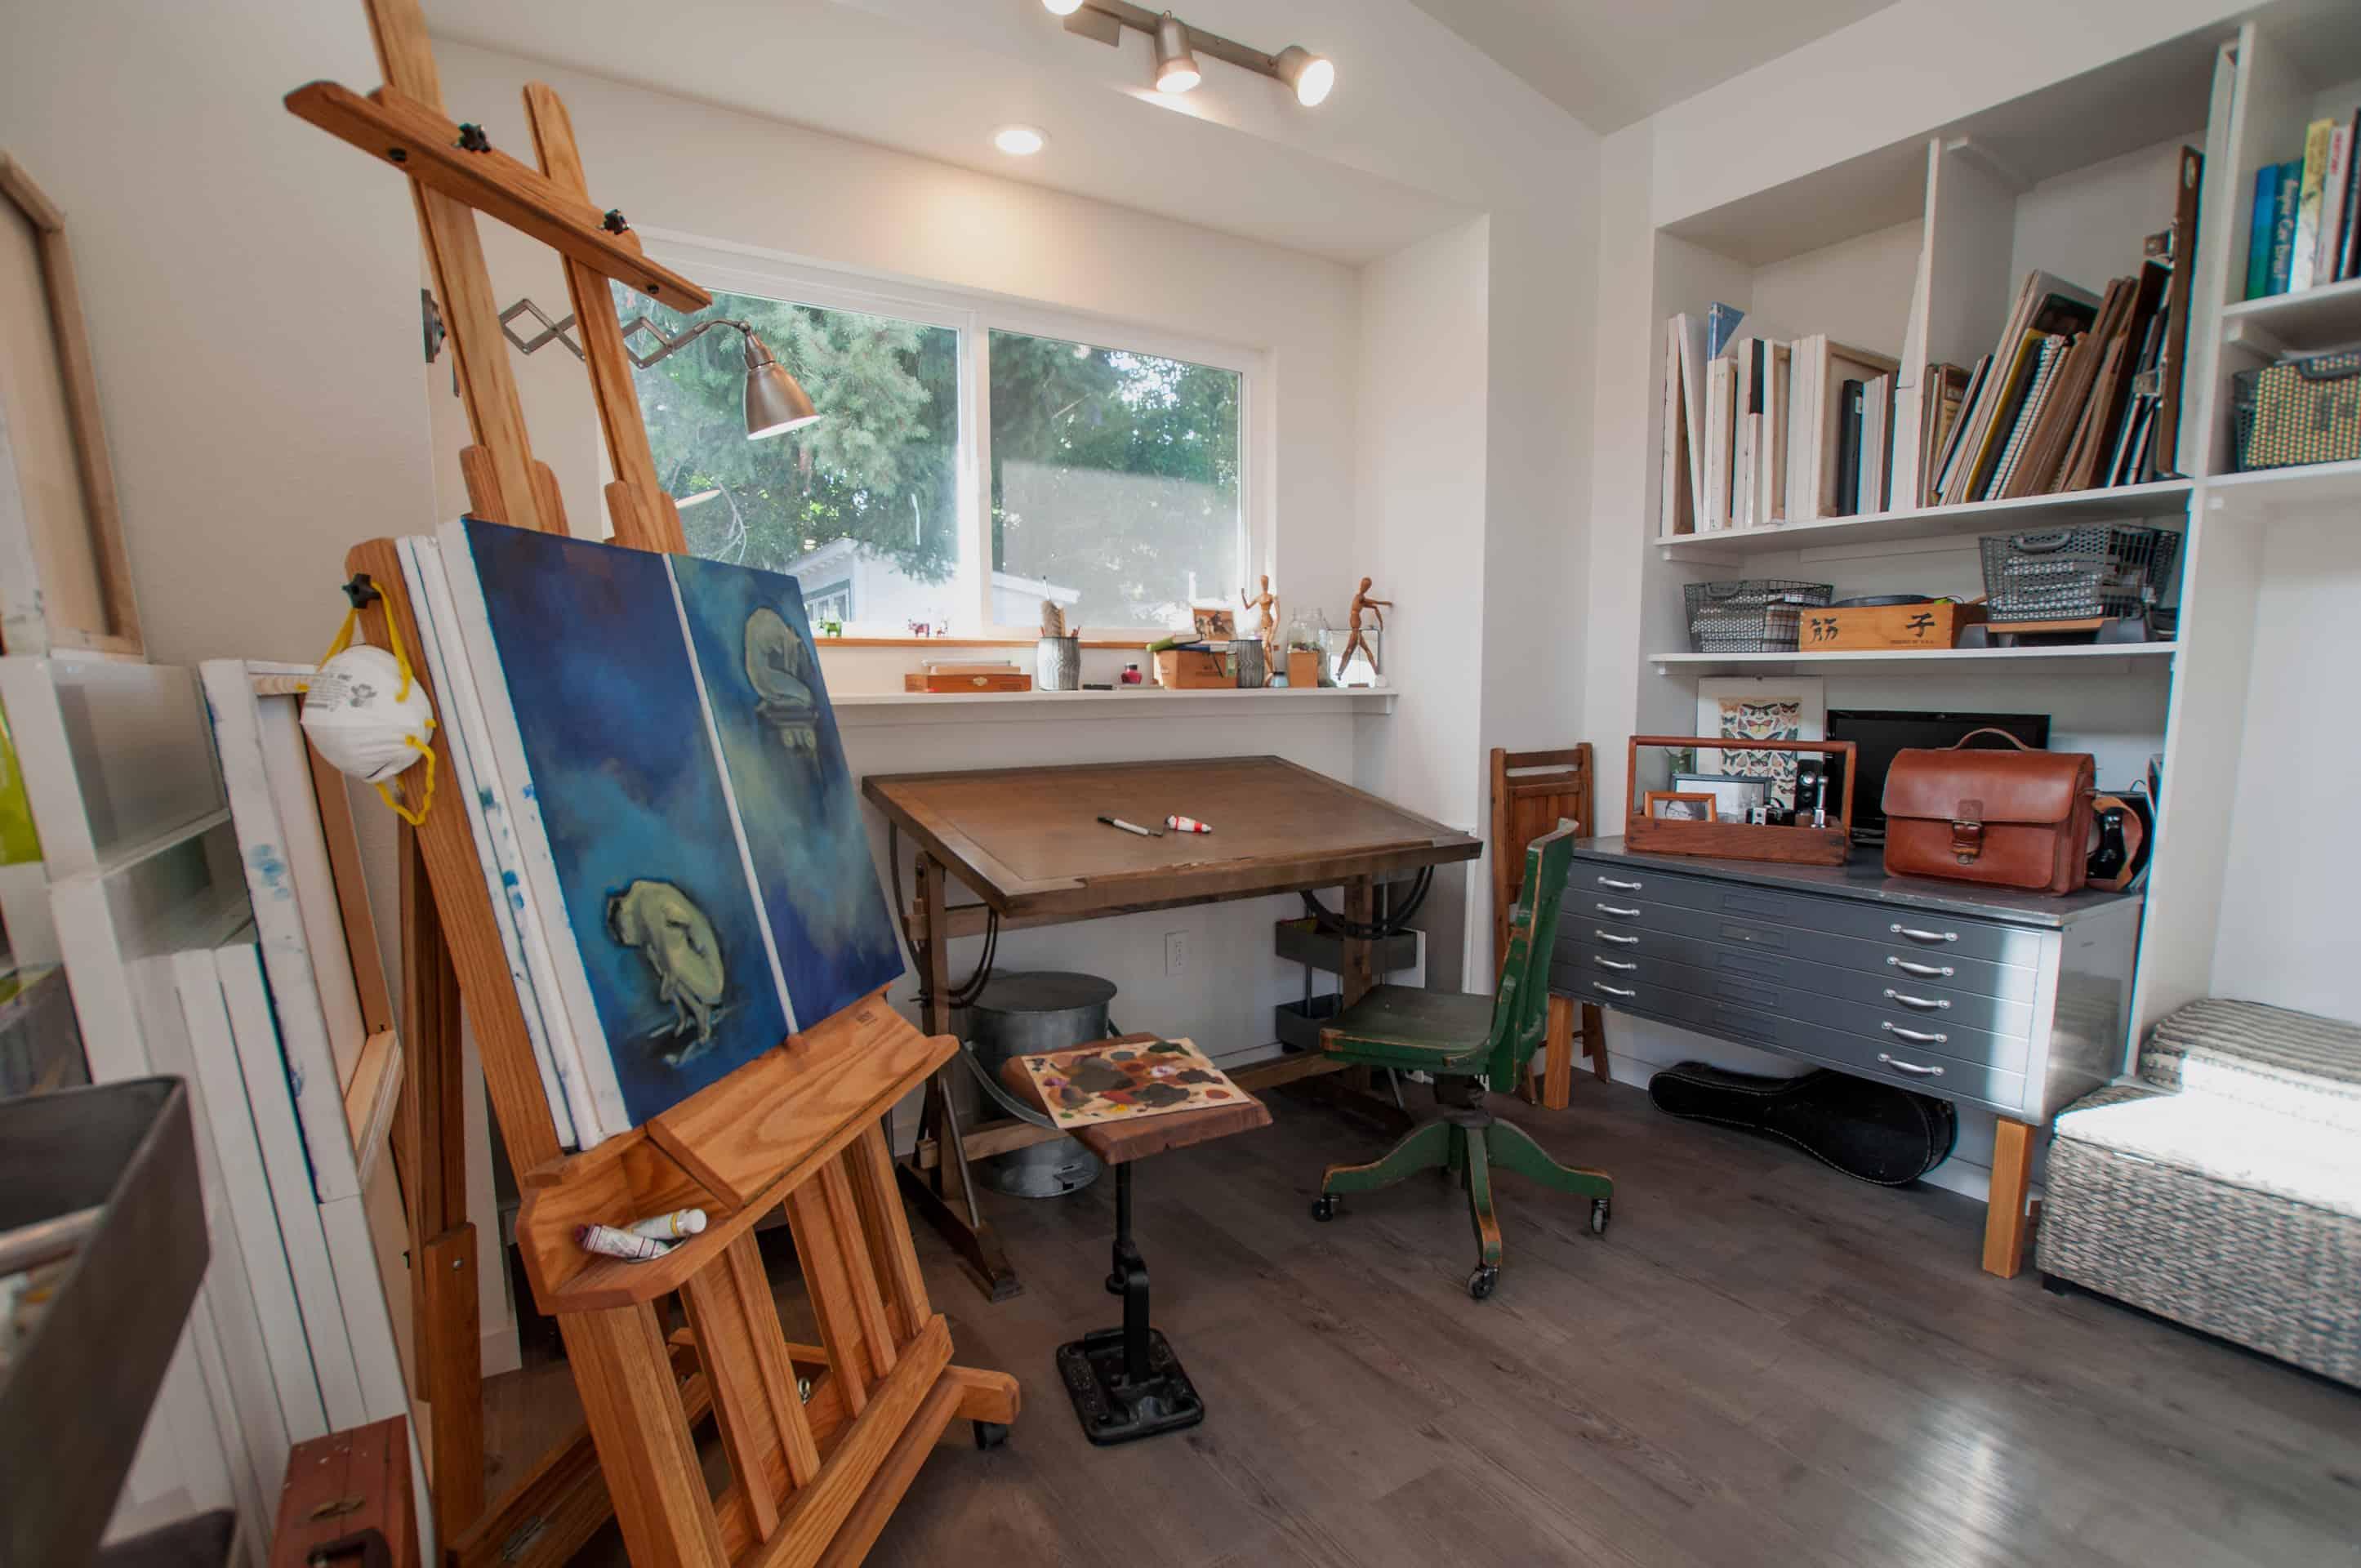 Design Tiny Home: Art Studio & Tiny House